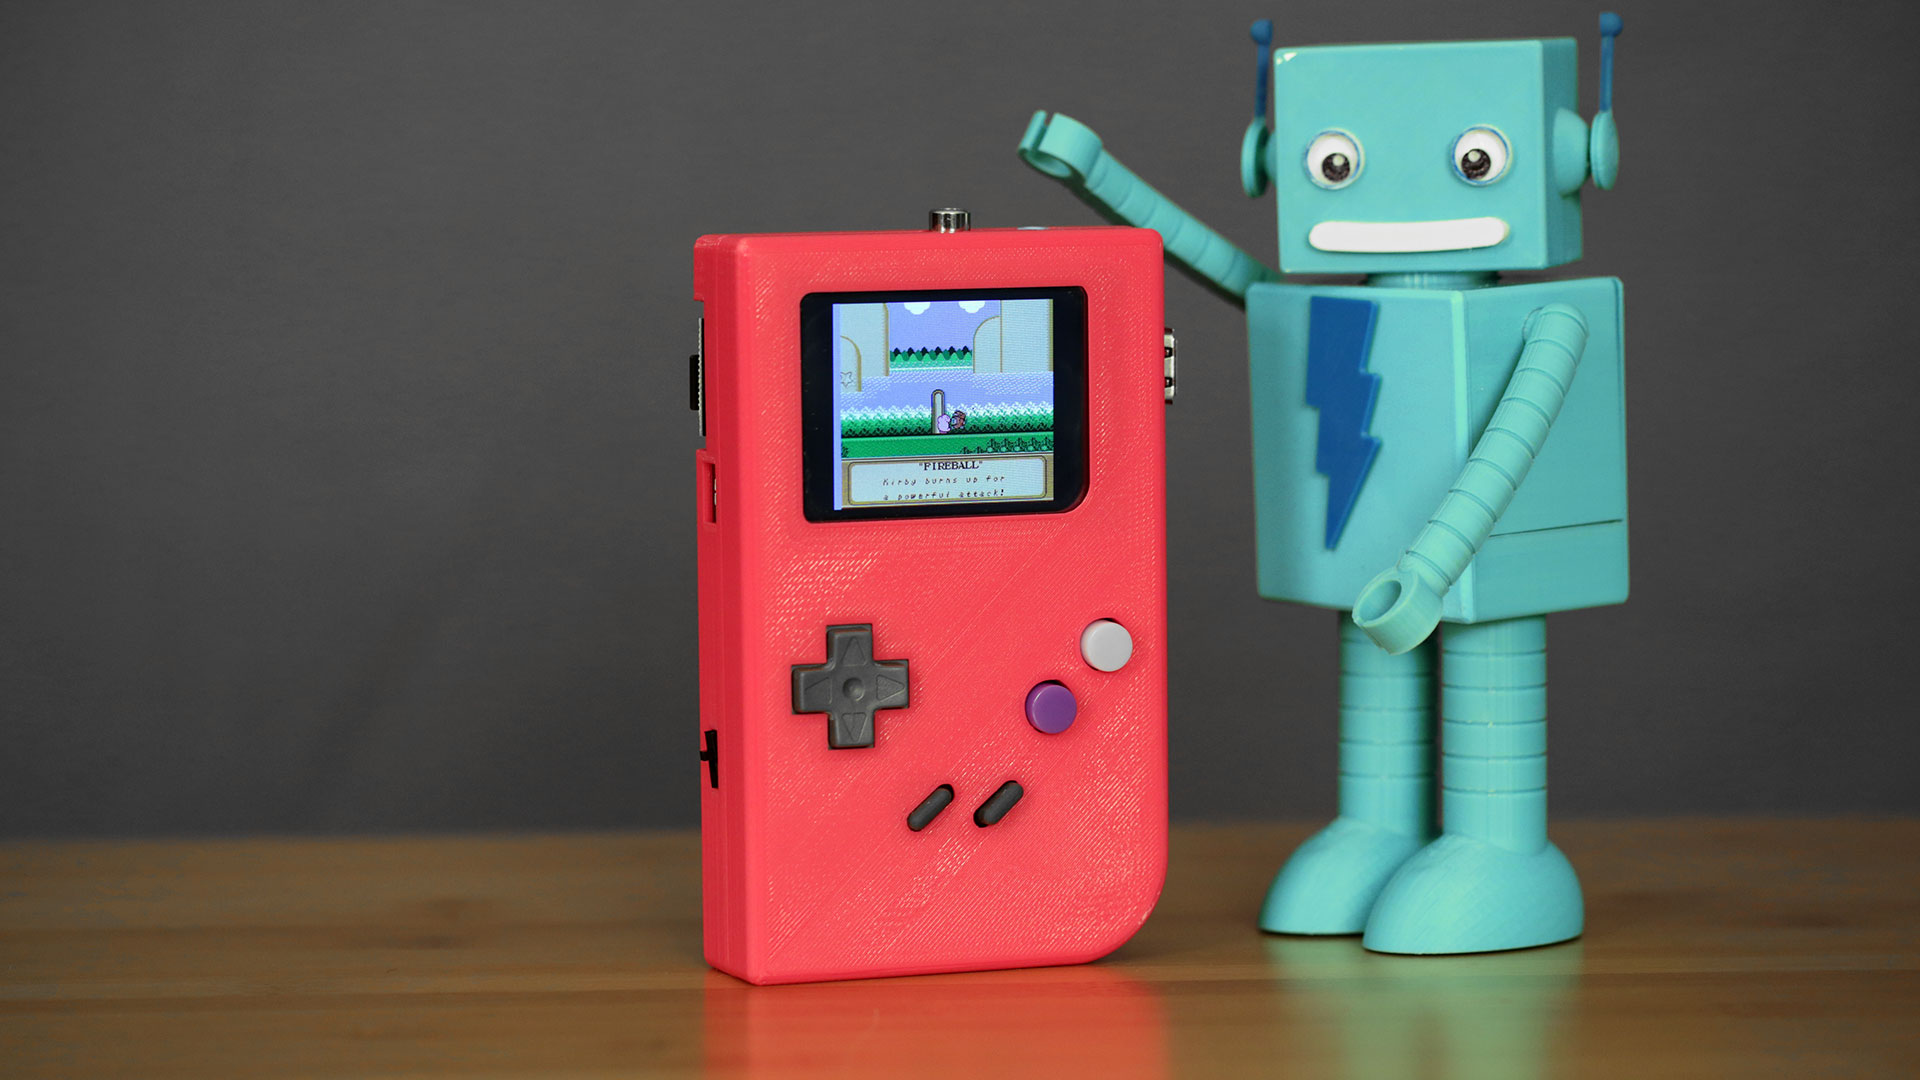 Diy Raspberry Pi Gameboy By Adafruit Thingiverse Making Systems Circuit Jul 2 2014 View Original